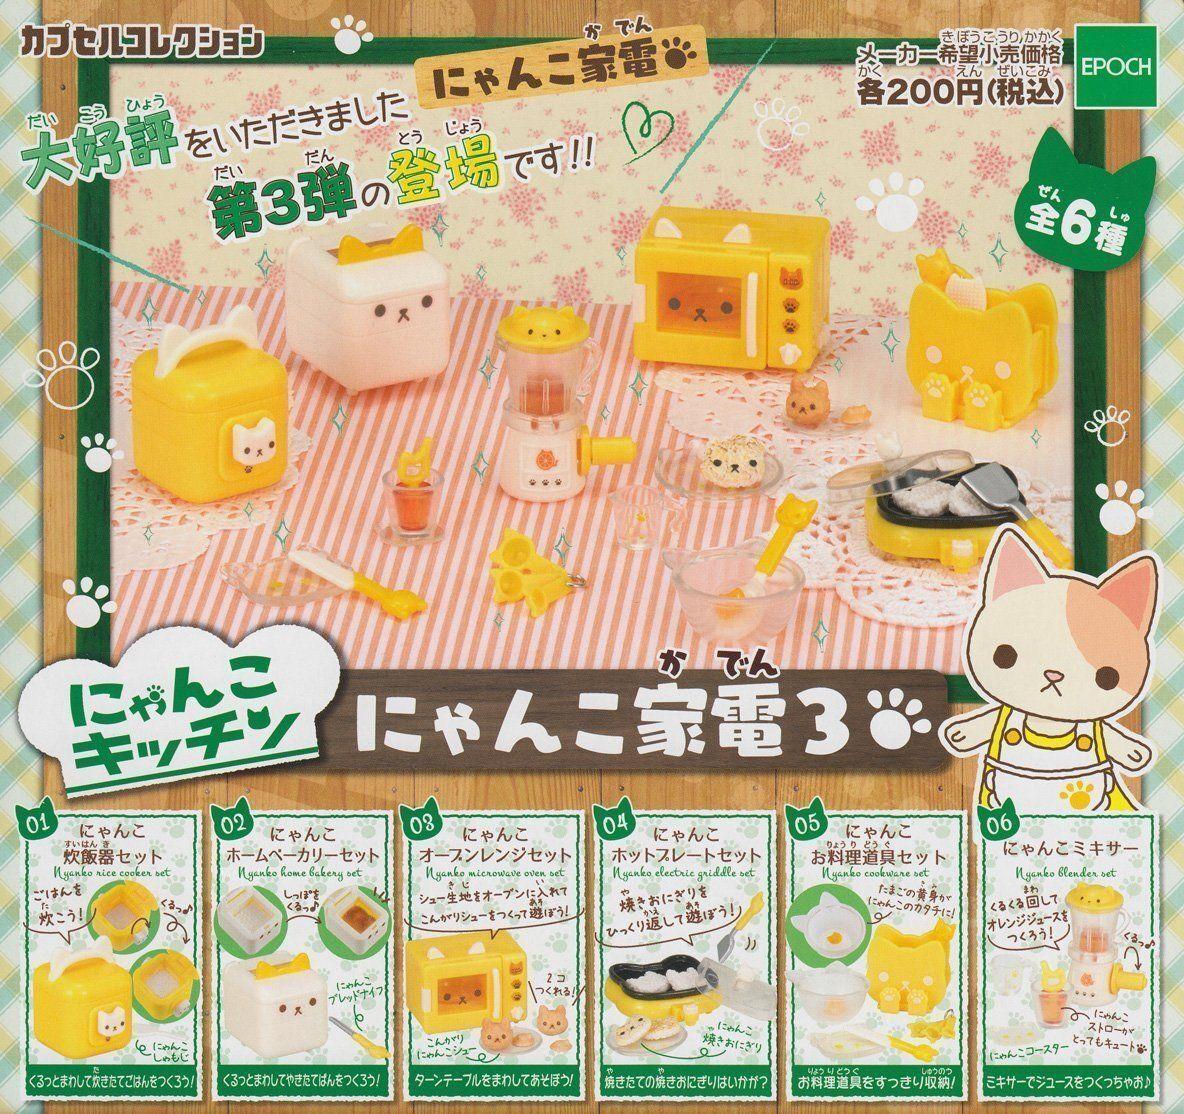 Epoch Gasha Nyanko kitchen Nyanko cat Part.3 Full set Re-ment rement re ment